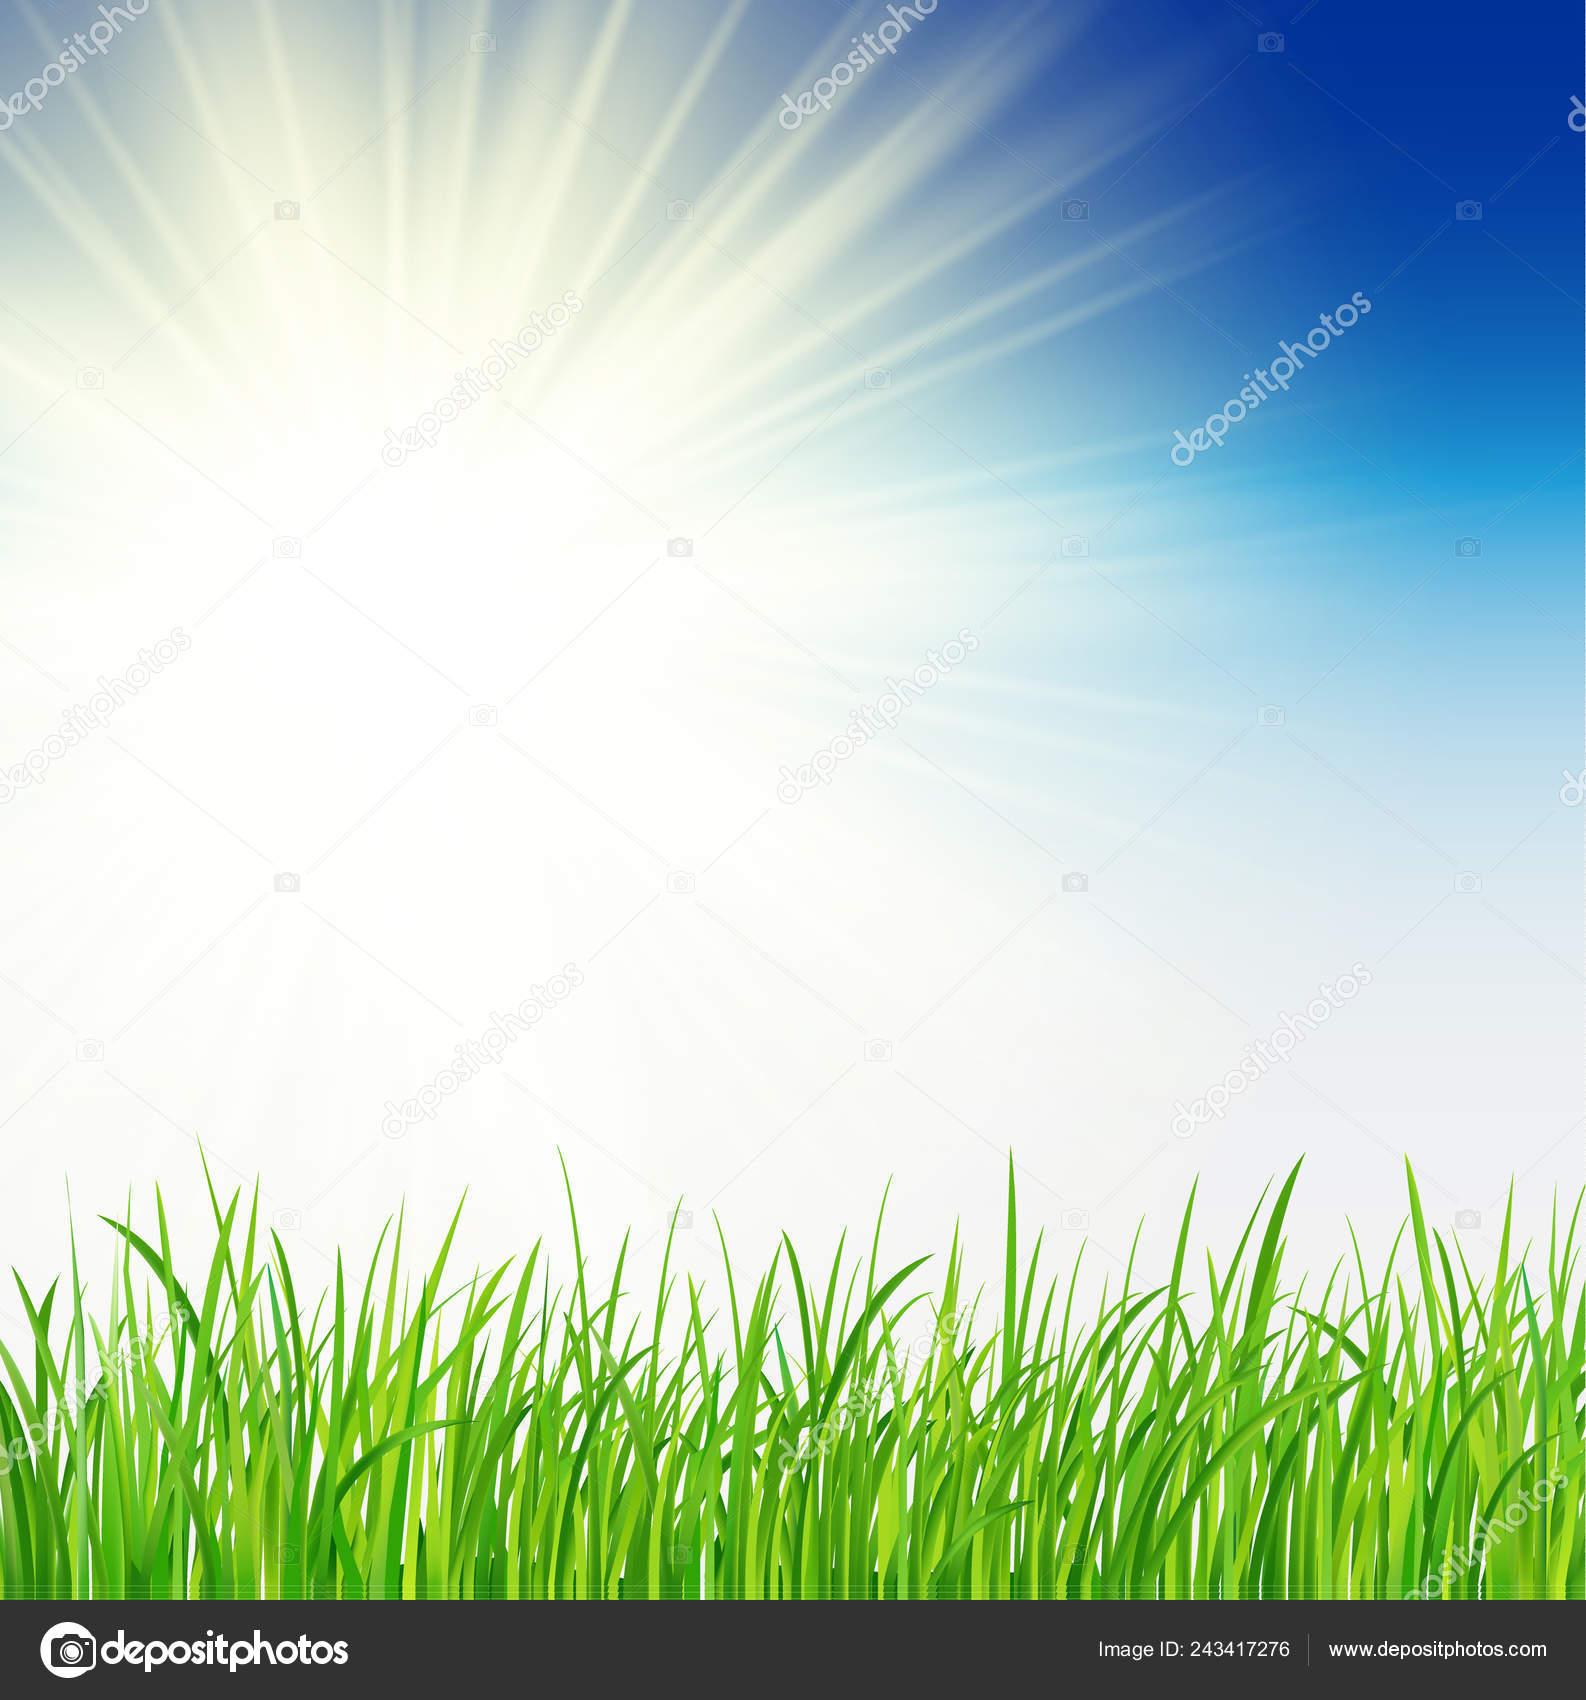 green background sun grass vector spring background vector sunny natural stock vector c antonvector 243417276 green background sun grass vector spring background vector sunny natural stock vector c antonvector 243417276